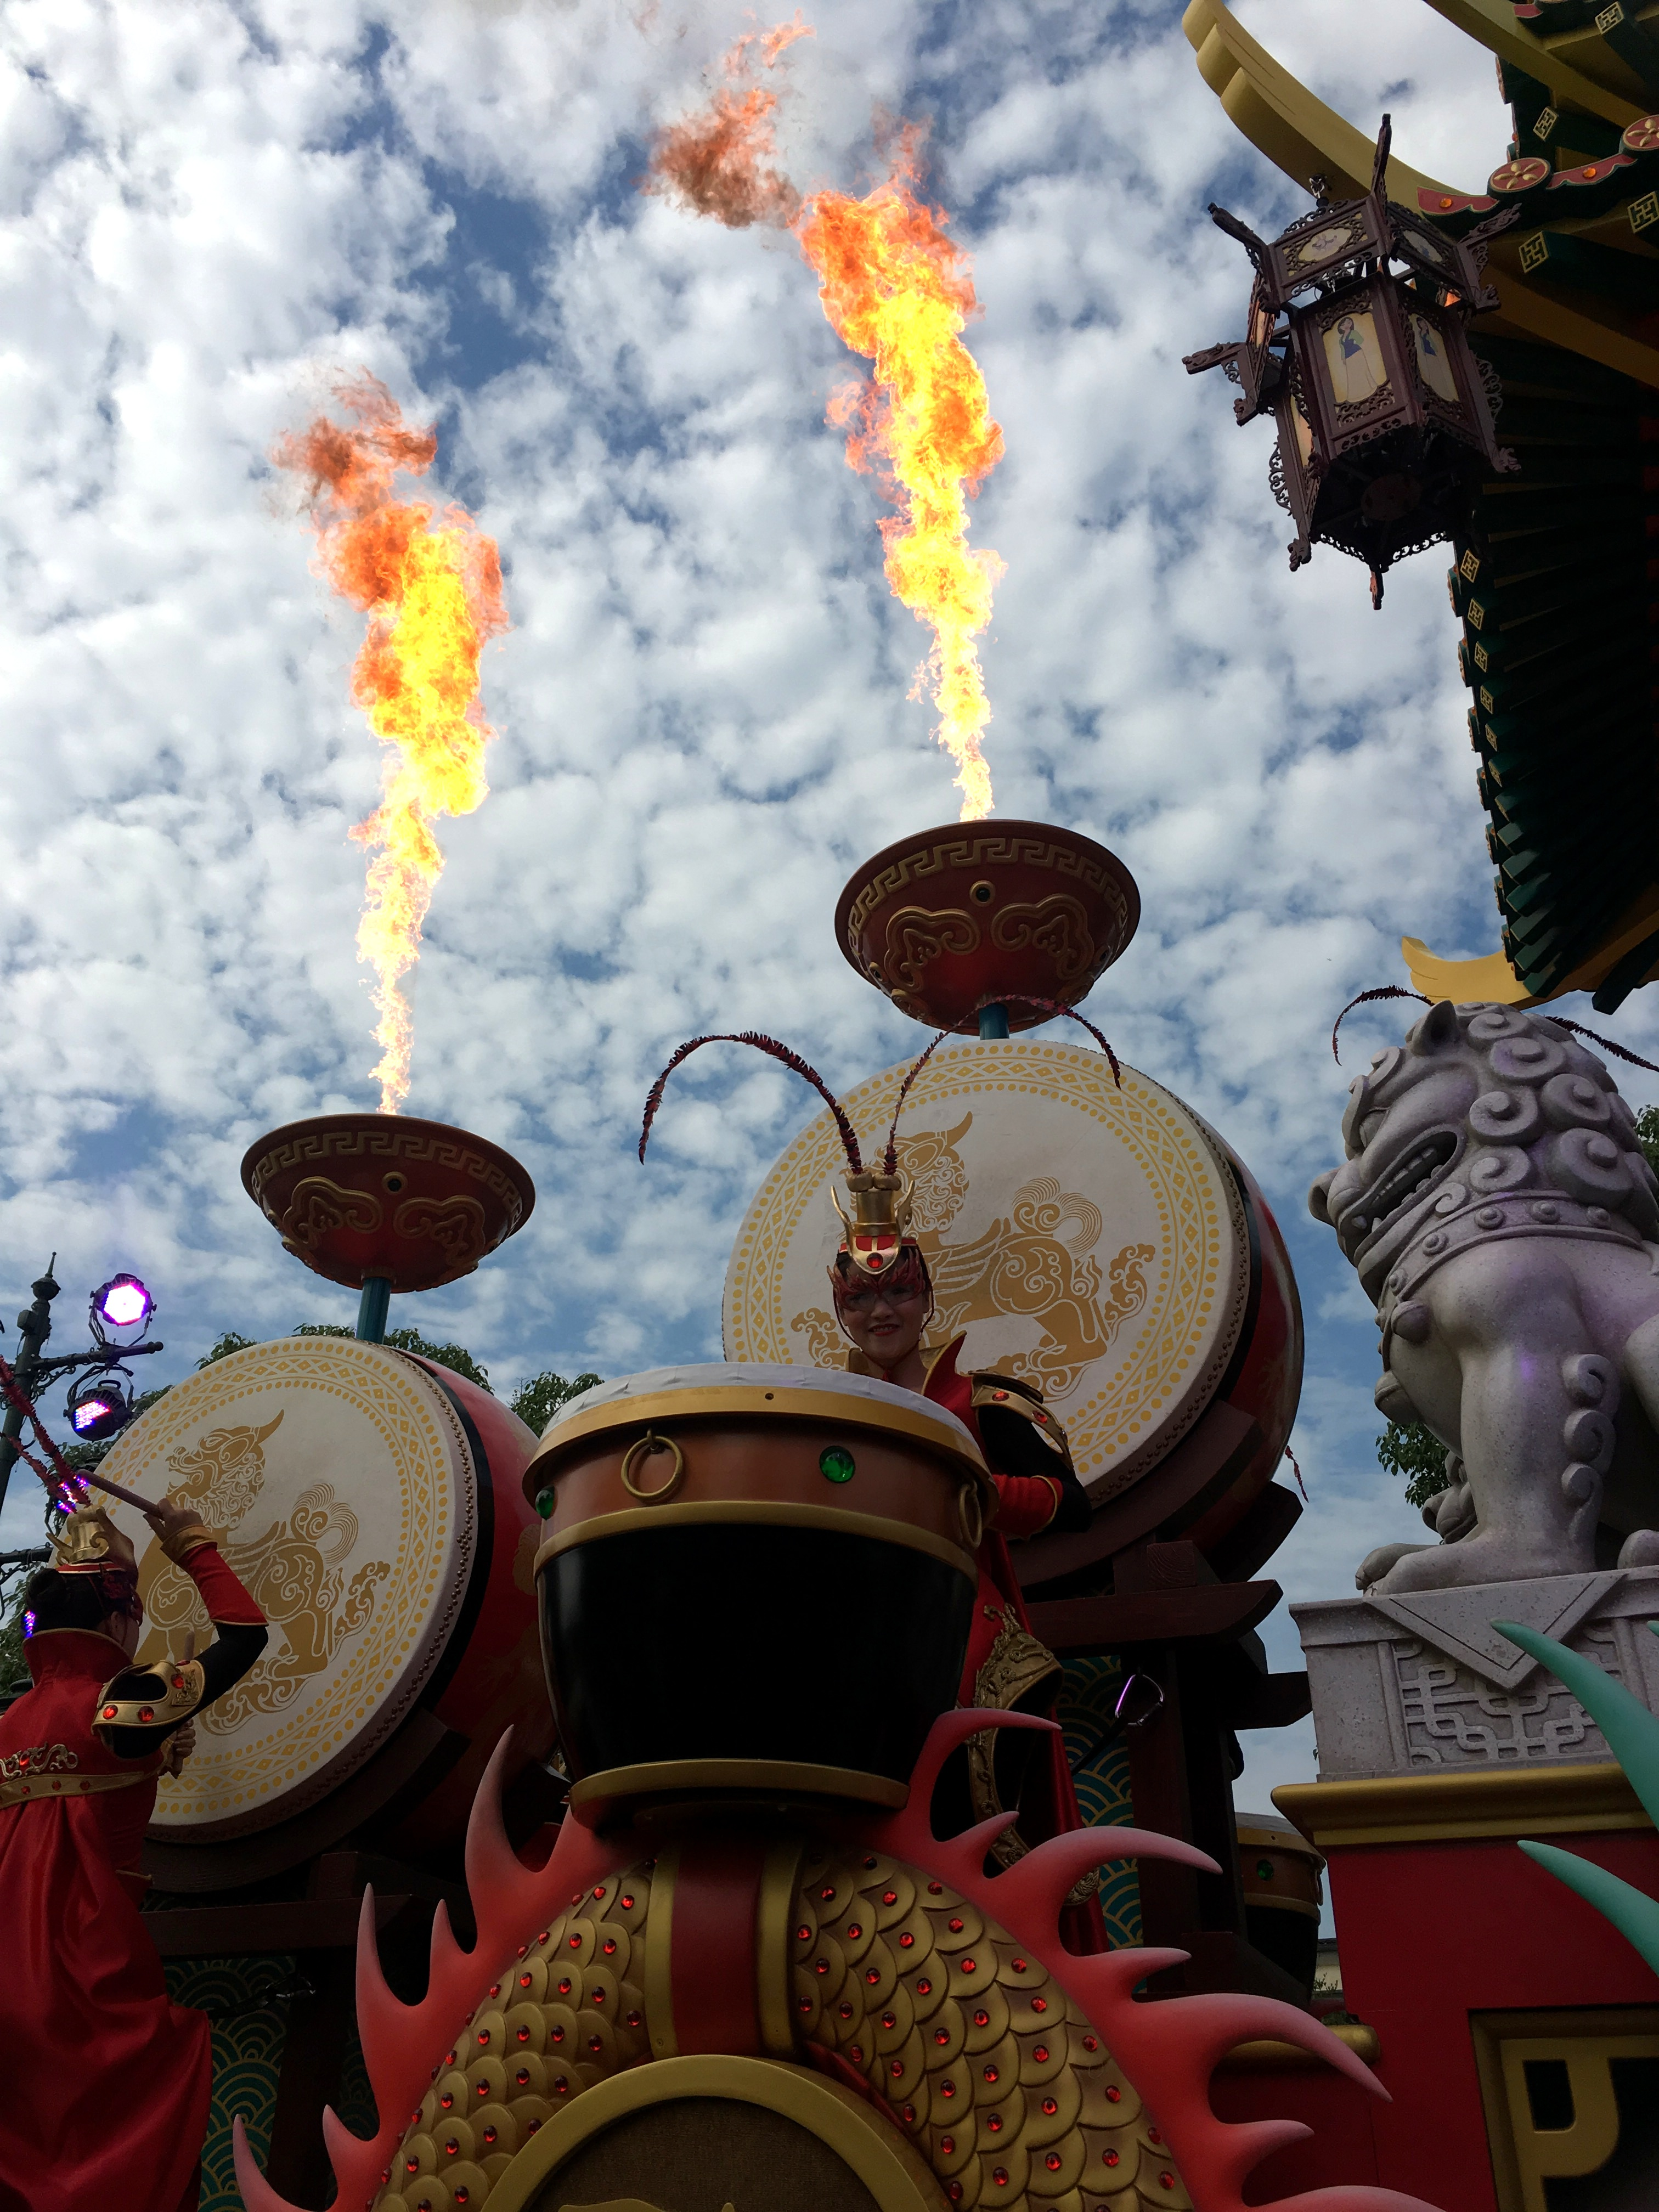 shanghai-disneyland-mickeys-storybook-express-parade-6